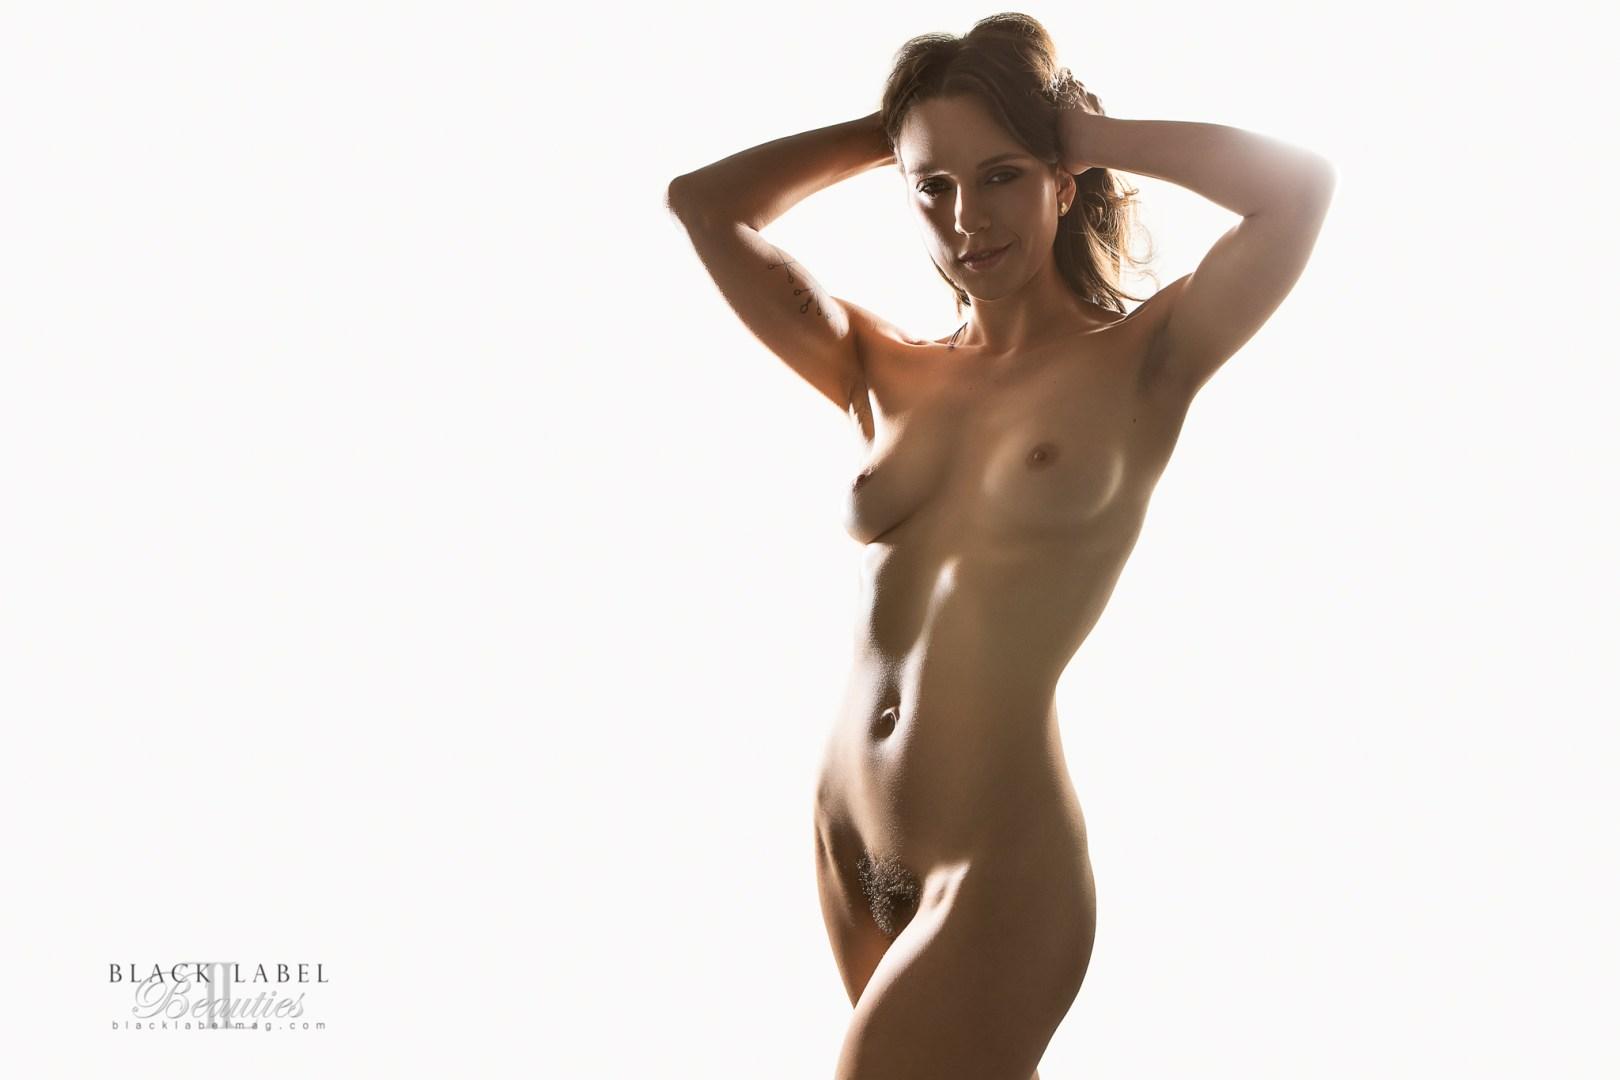 masturbation porn, Black Label Beauties, Jade Nile, lesbian, lesbian erotica, girl-girl porn, girls only porn